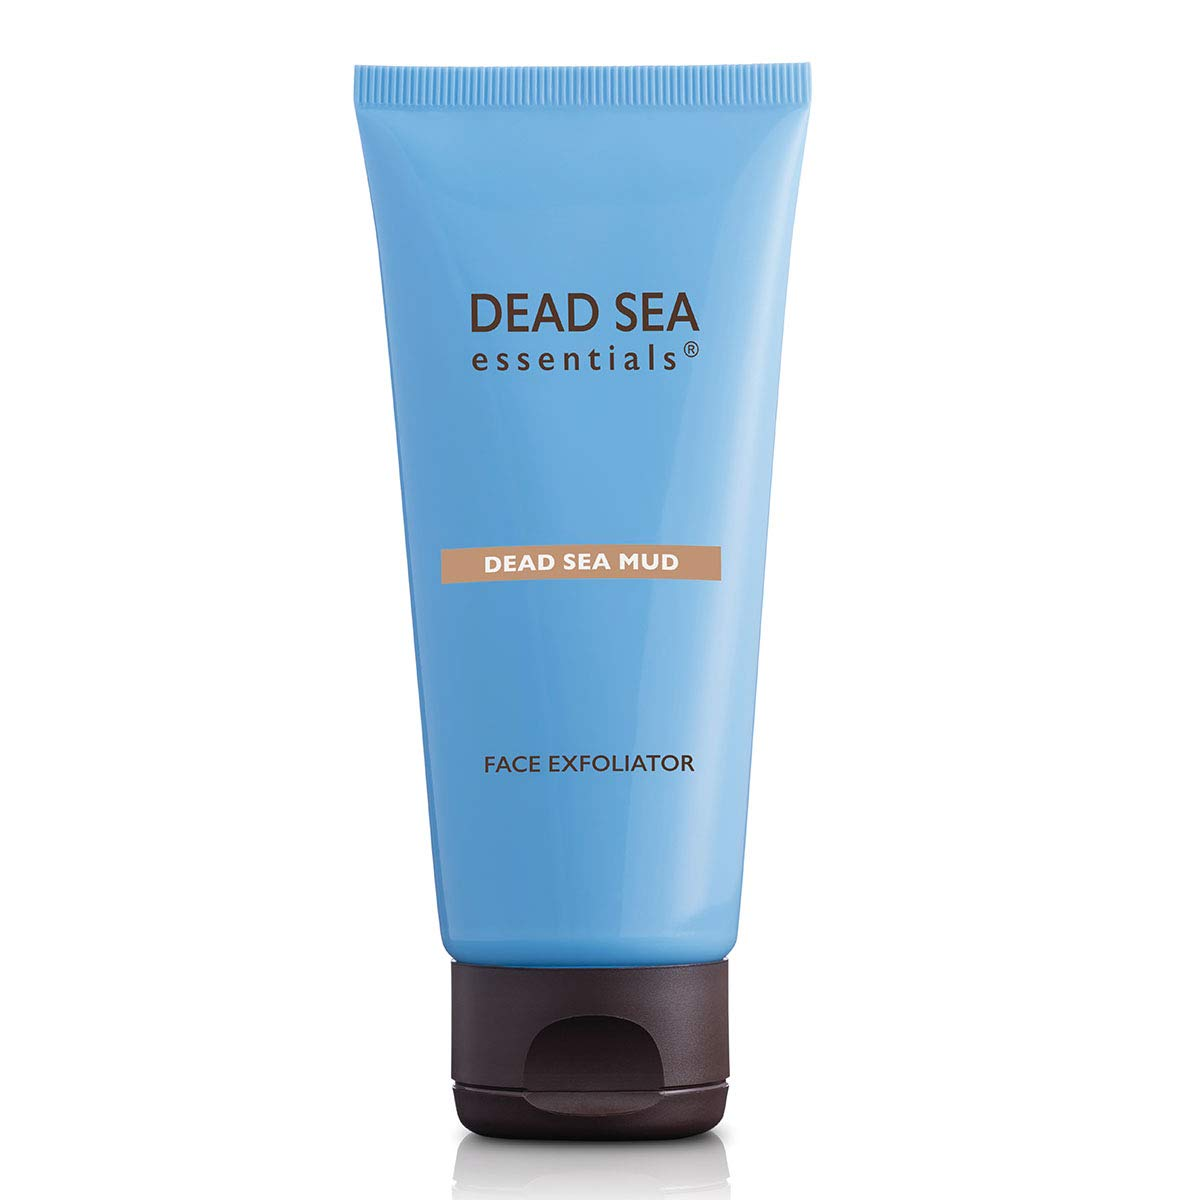 Dead Sea Essentials Mud Face Exfoliator-Dead Sea Minerals & Mud Powered Facial Exfoliator-All Skin Types-Made in Israel-Clean Cruelty Free Skincare-Travel Ready – 3.38 Fl oz-100 ml